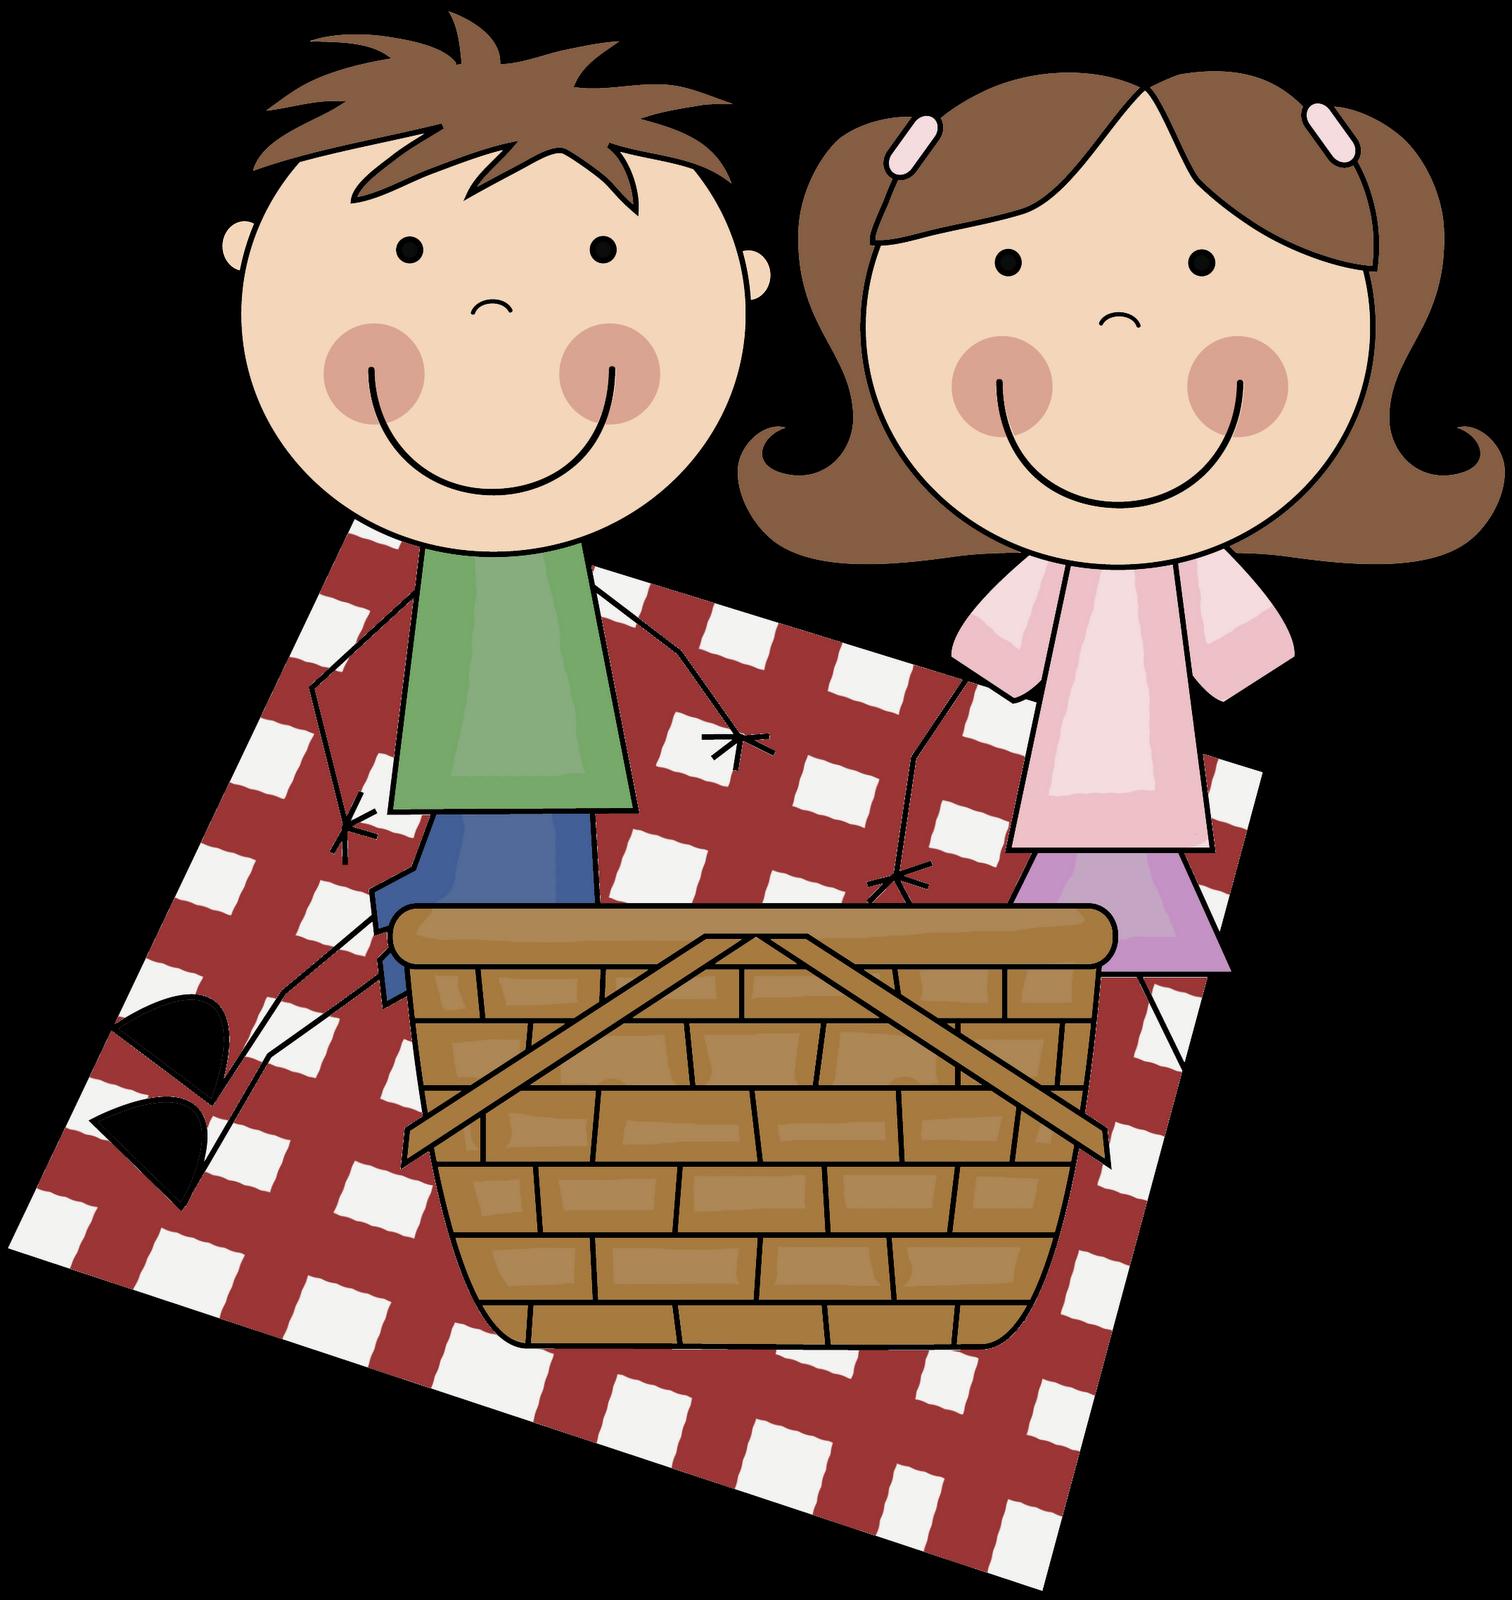 Picnic Basket clipart company picnic Clipart Picnic Info Blanket Free